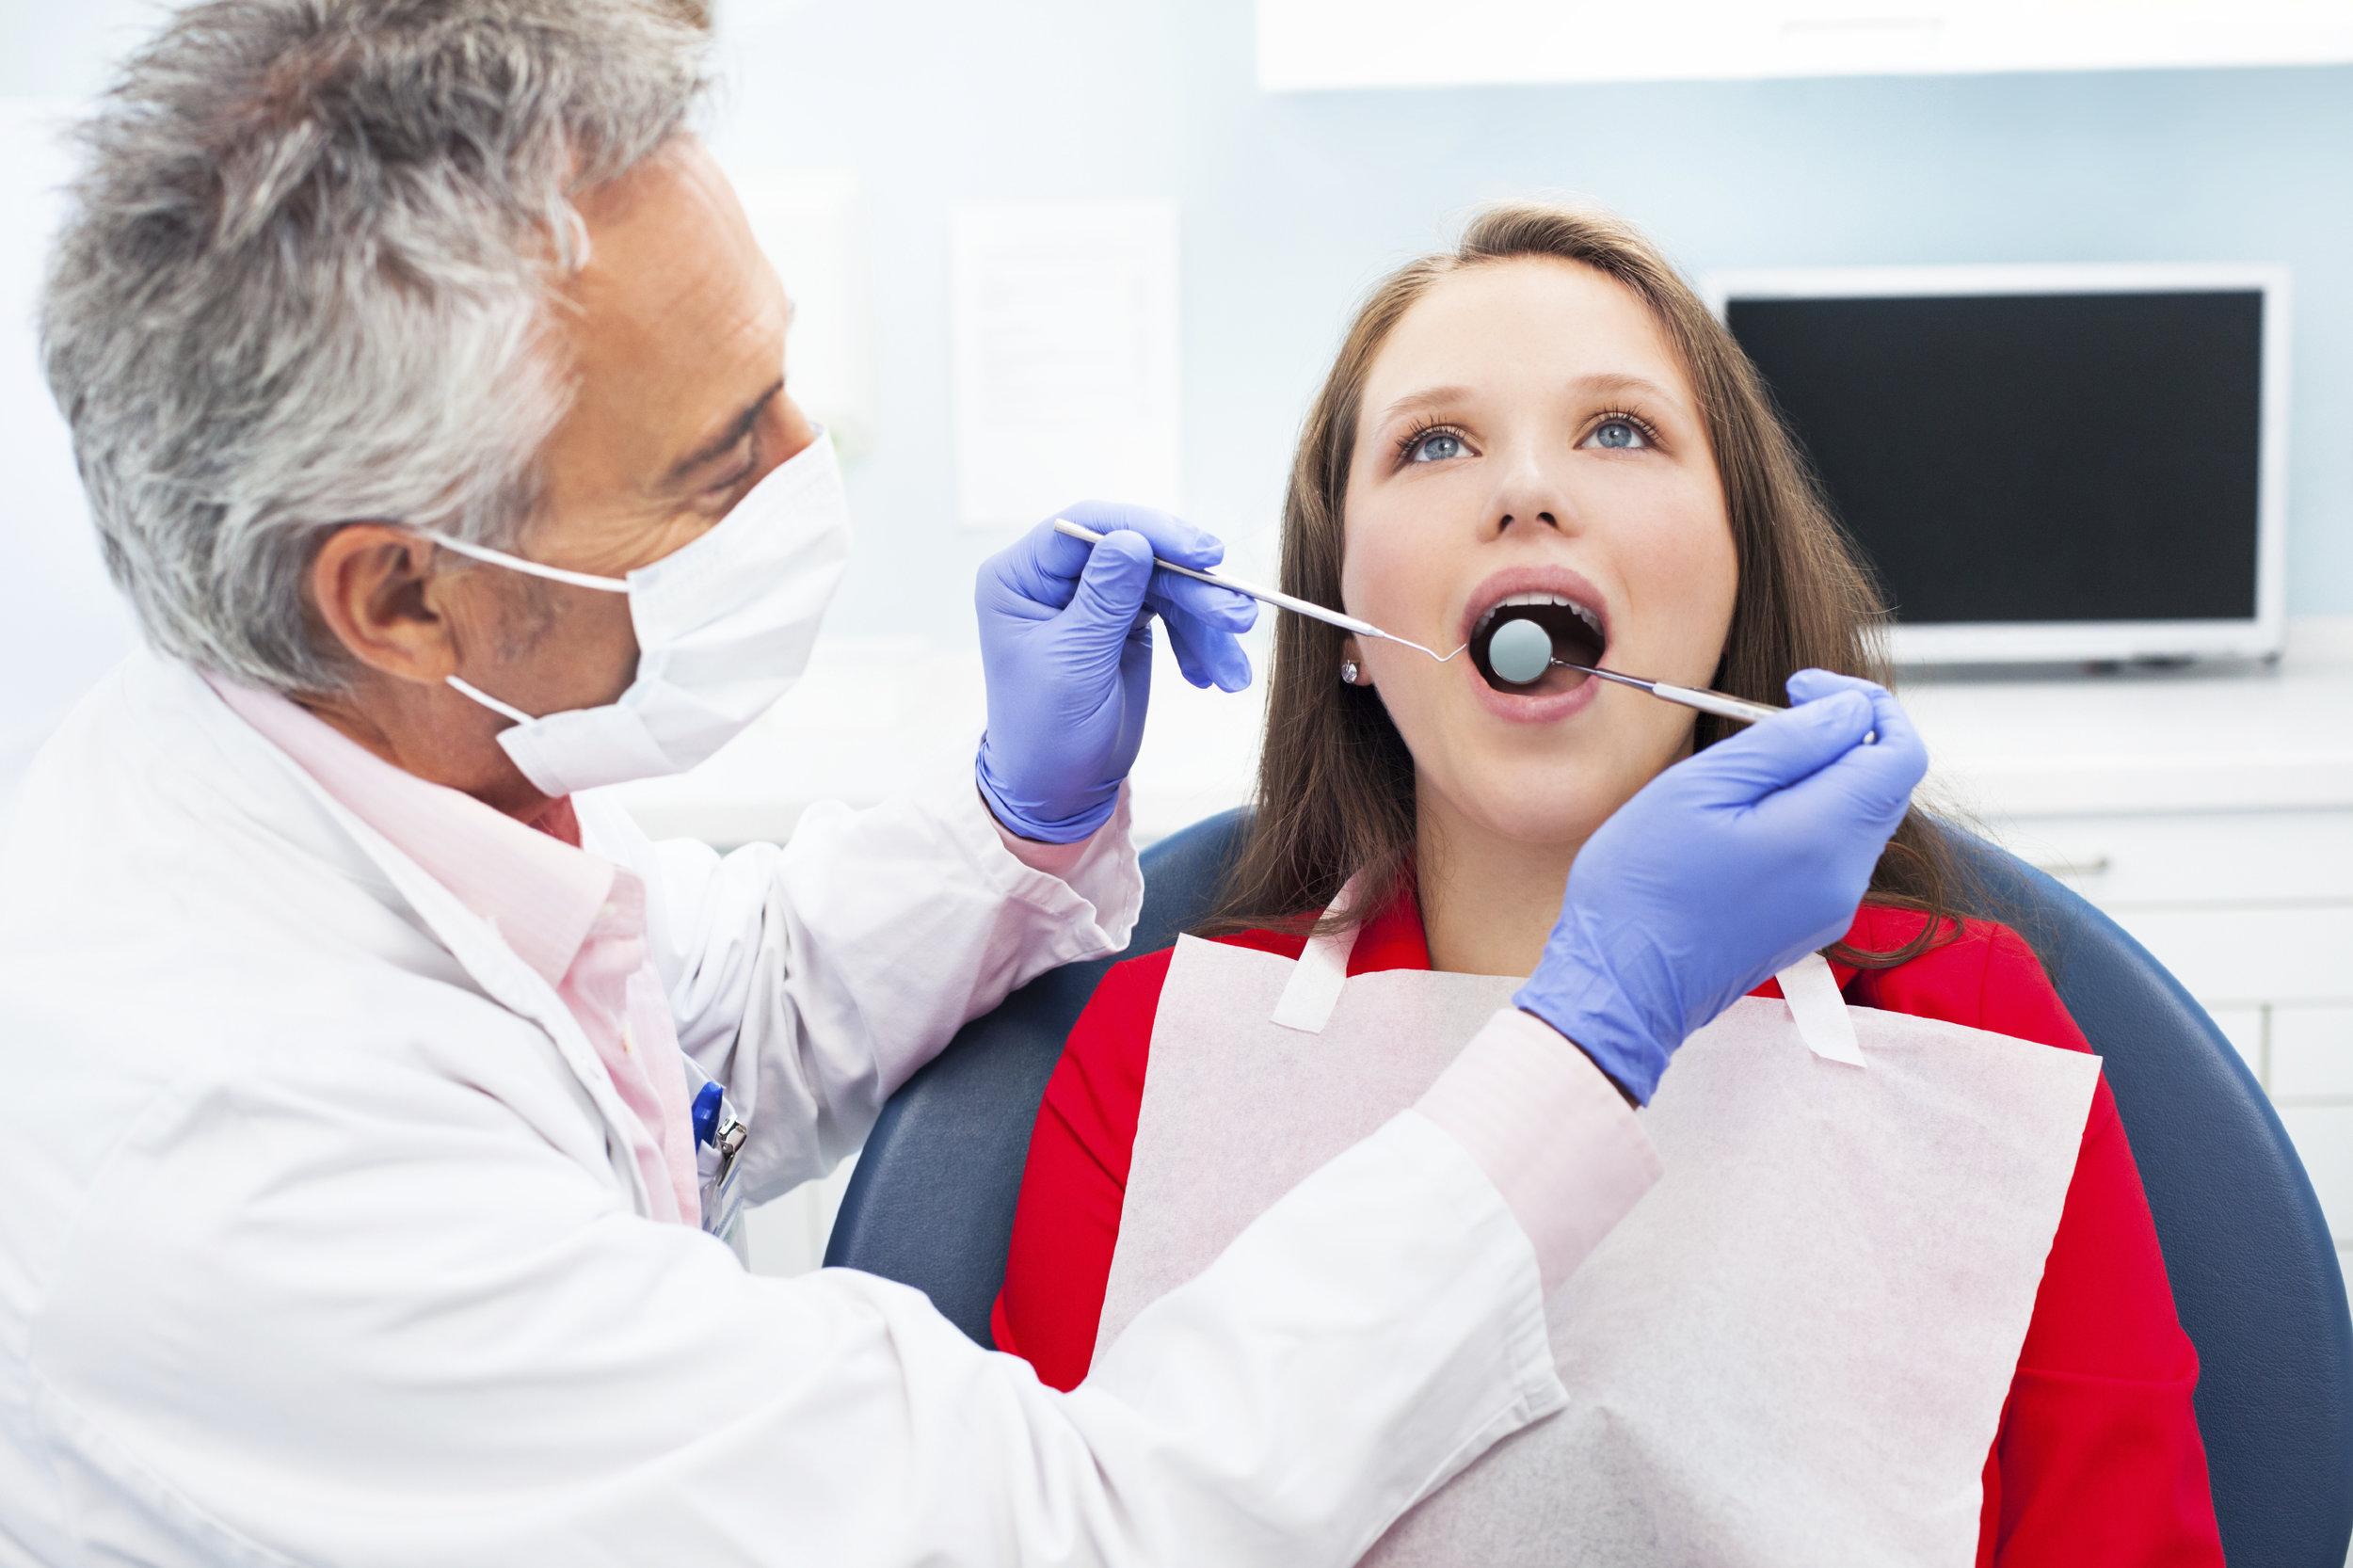 woman at dentist.jpg